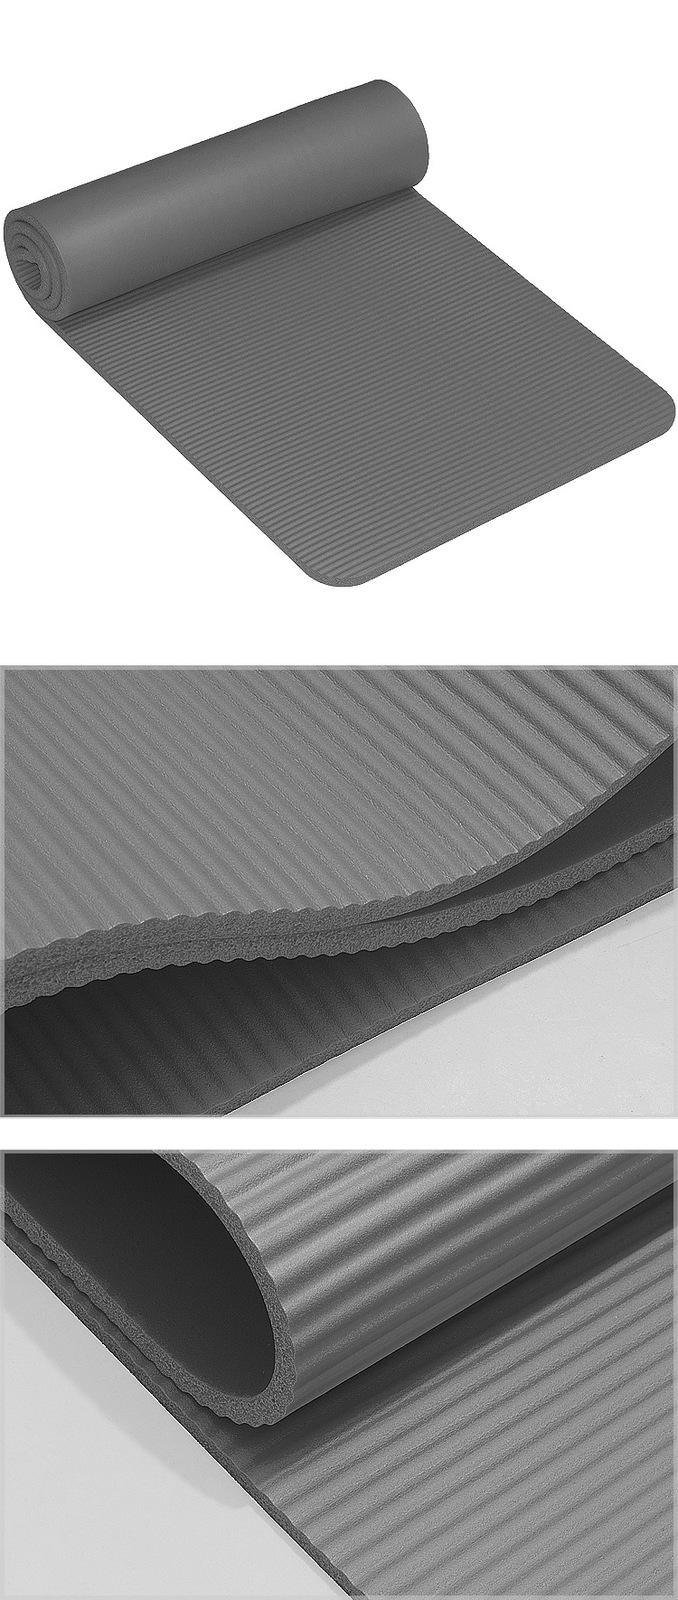 Yoga Mat, 10mm non-slip